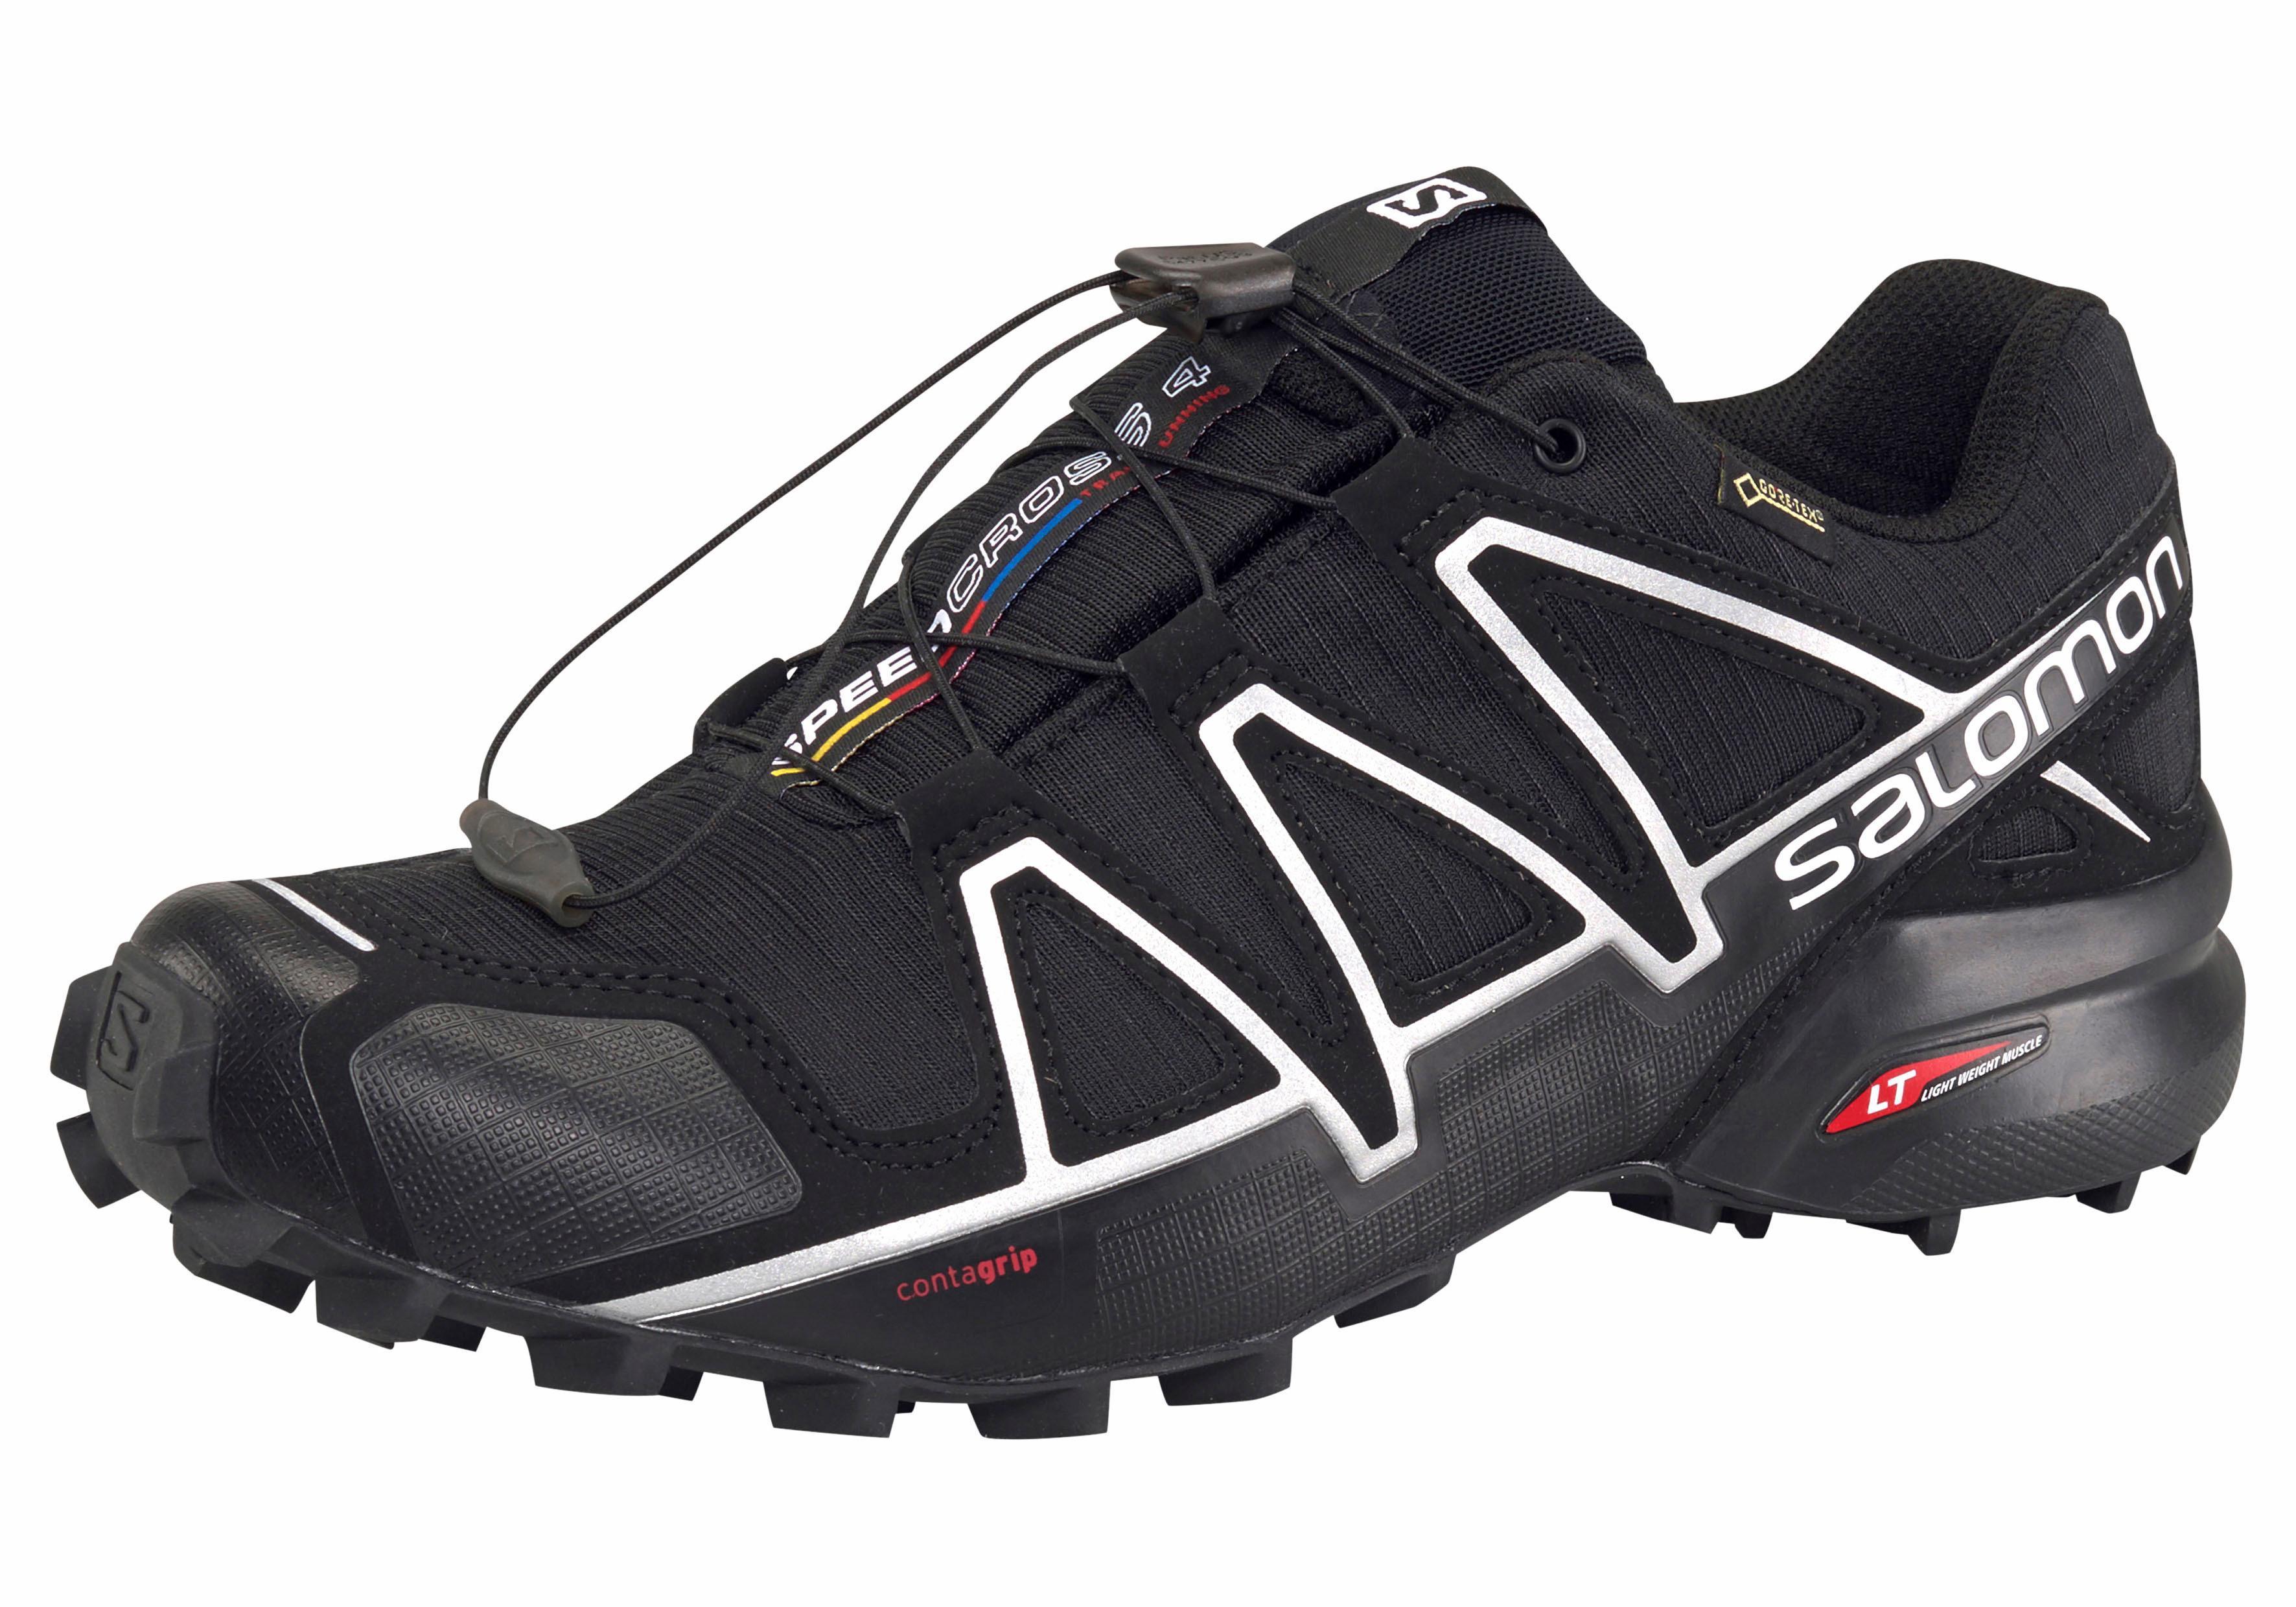 Salomon Laufschuh Speedcross 4 Gore-Tex | Schuhe > Sportschuhe > Laufschuhe | Schwarz | Salomon